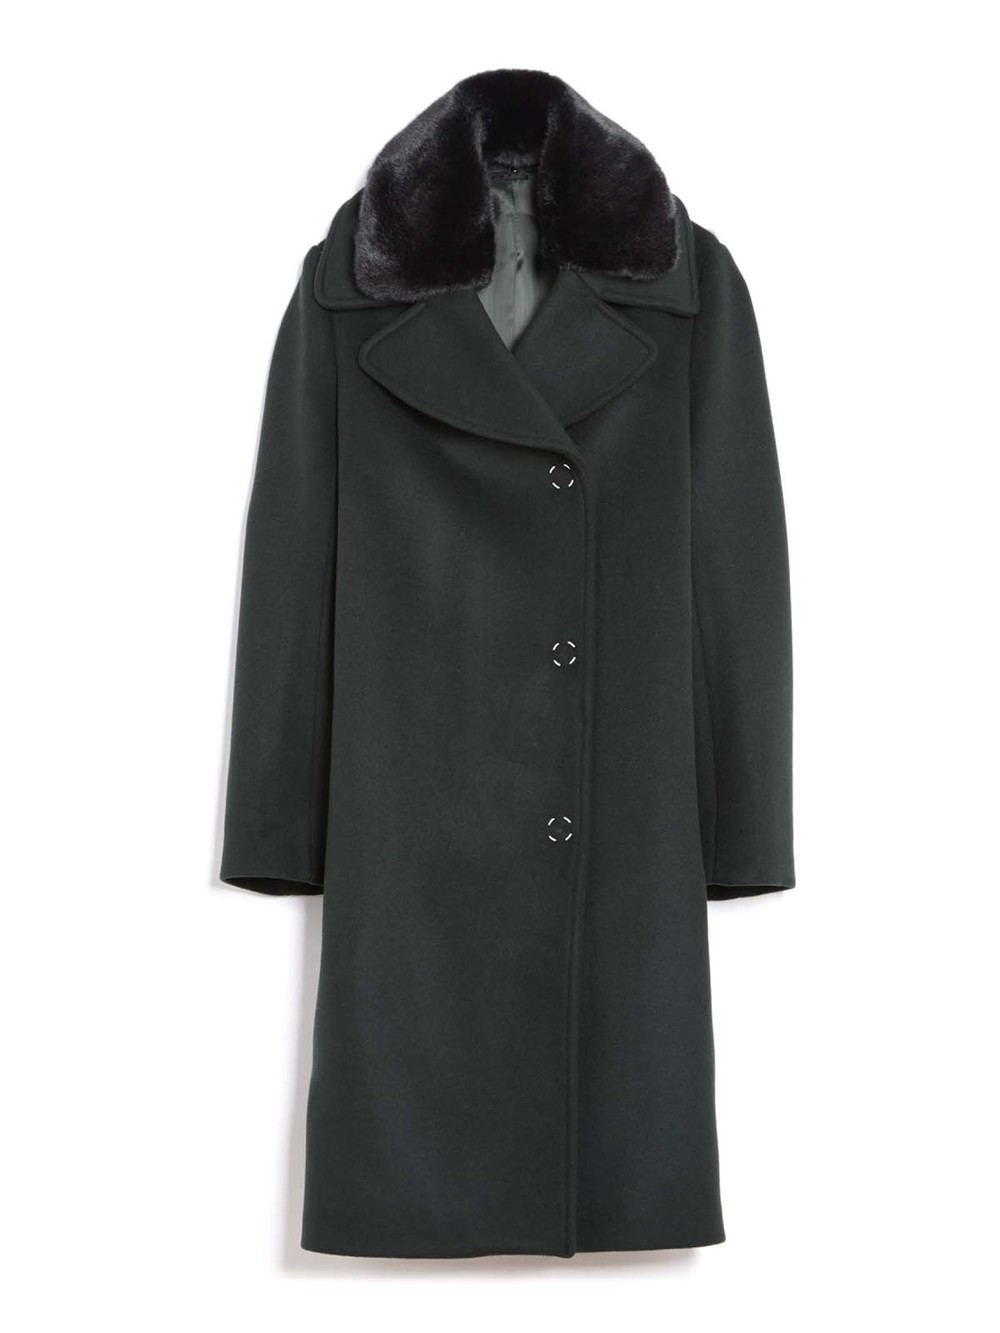 era-car-coat-343.jpg